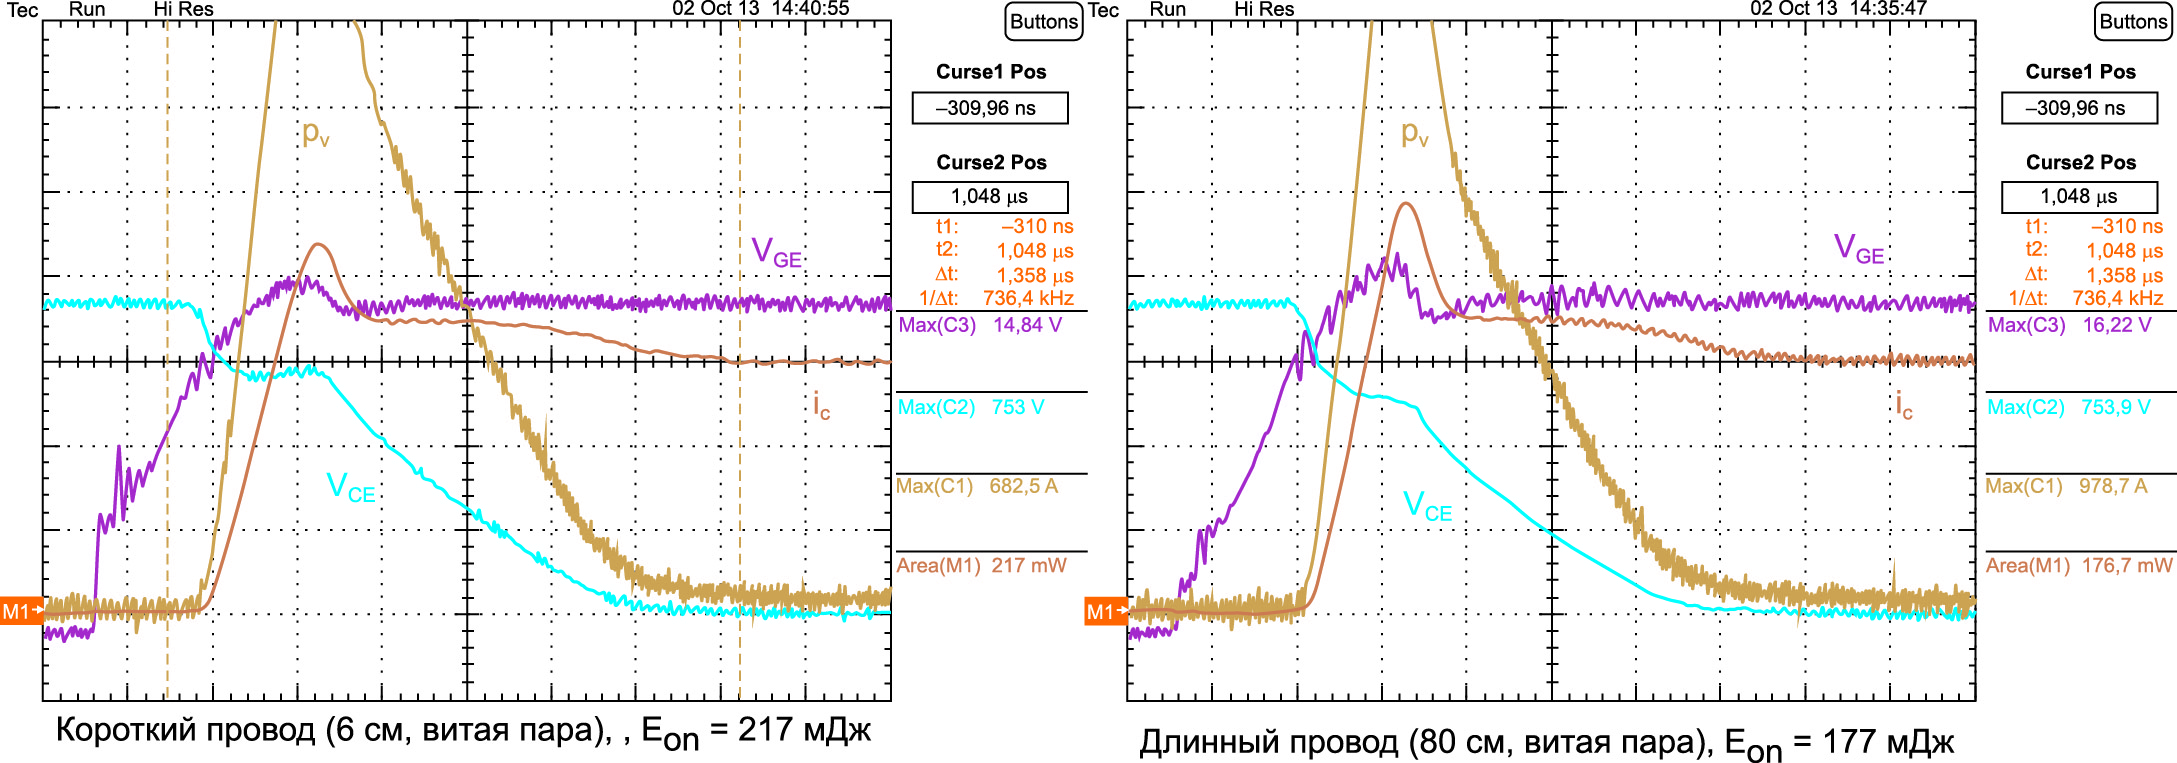 Энергия включения Eon IGBT Trench 4 (1200 В / 450 А) при двух значениях индуктивности цепи управления LG